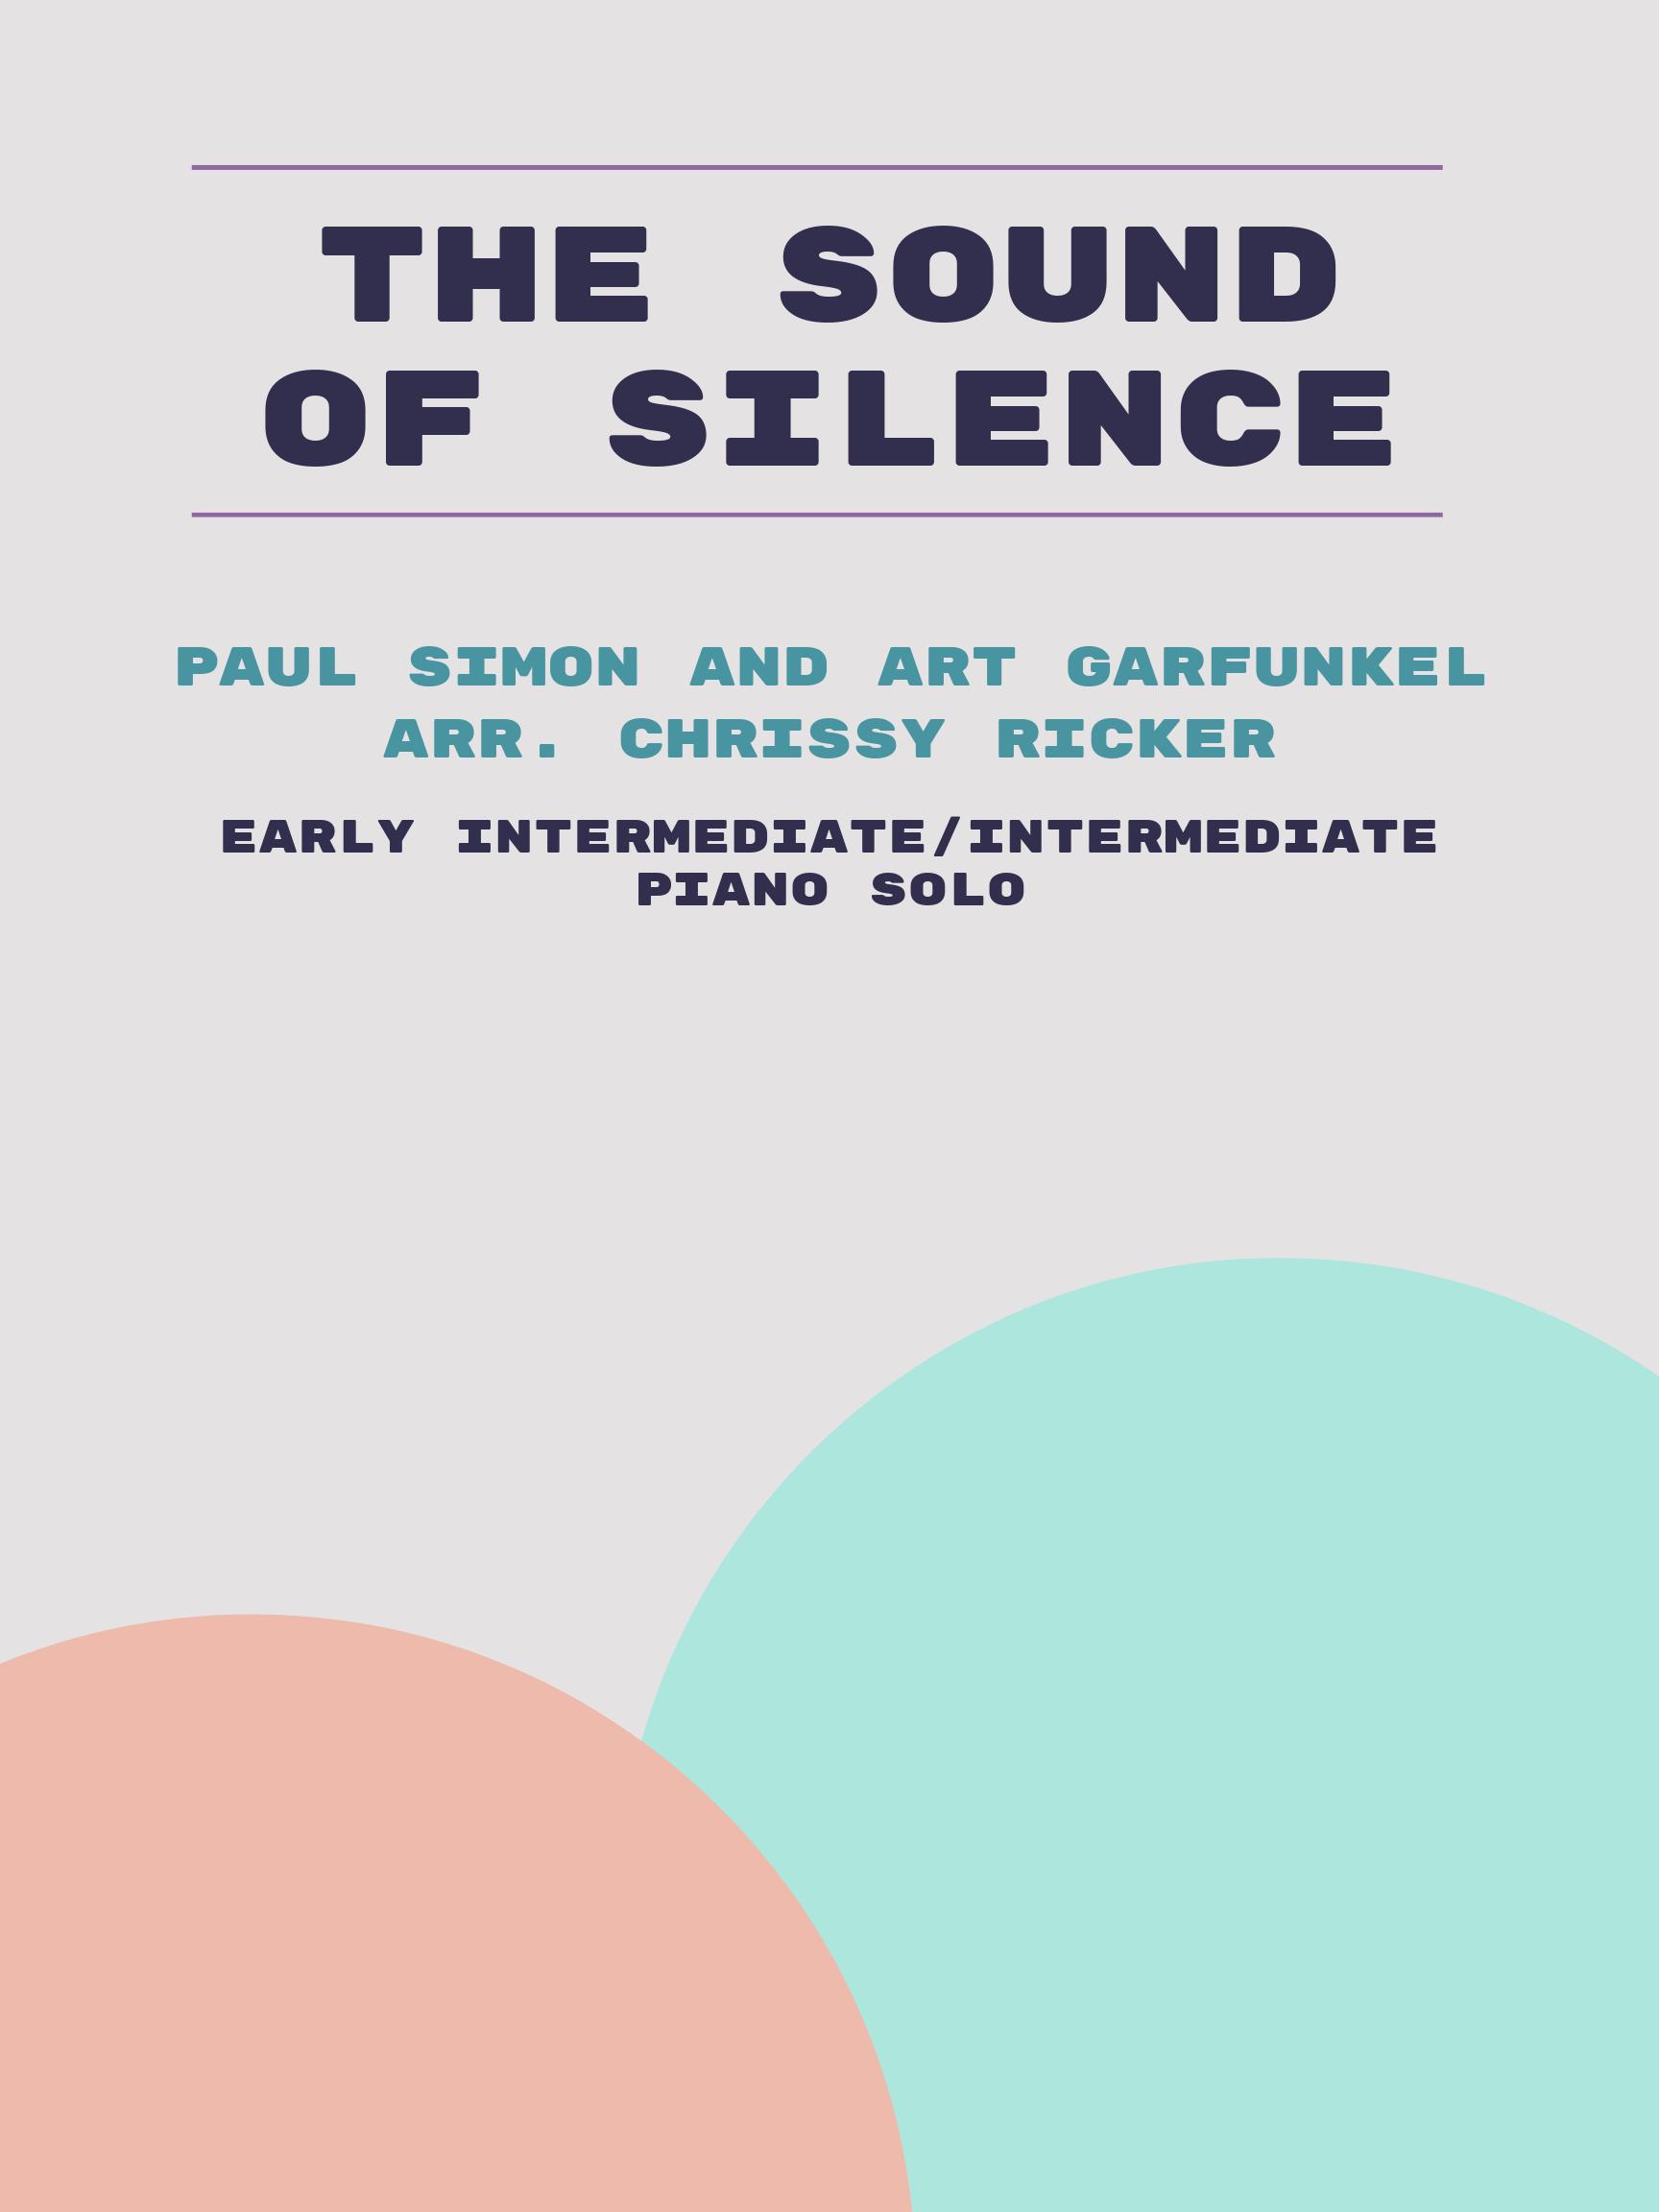 The Sound of Silence by Paul Simon and Art Garfunkel